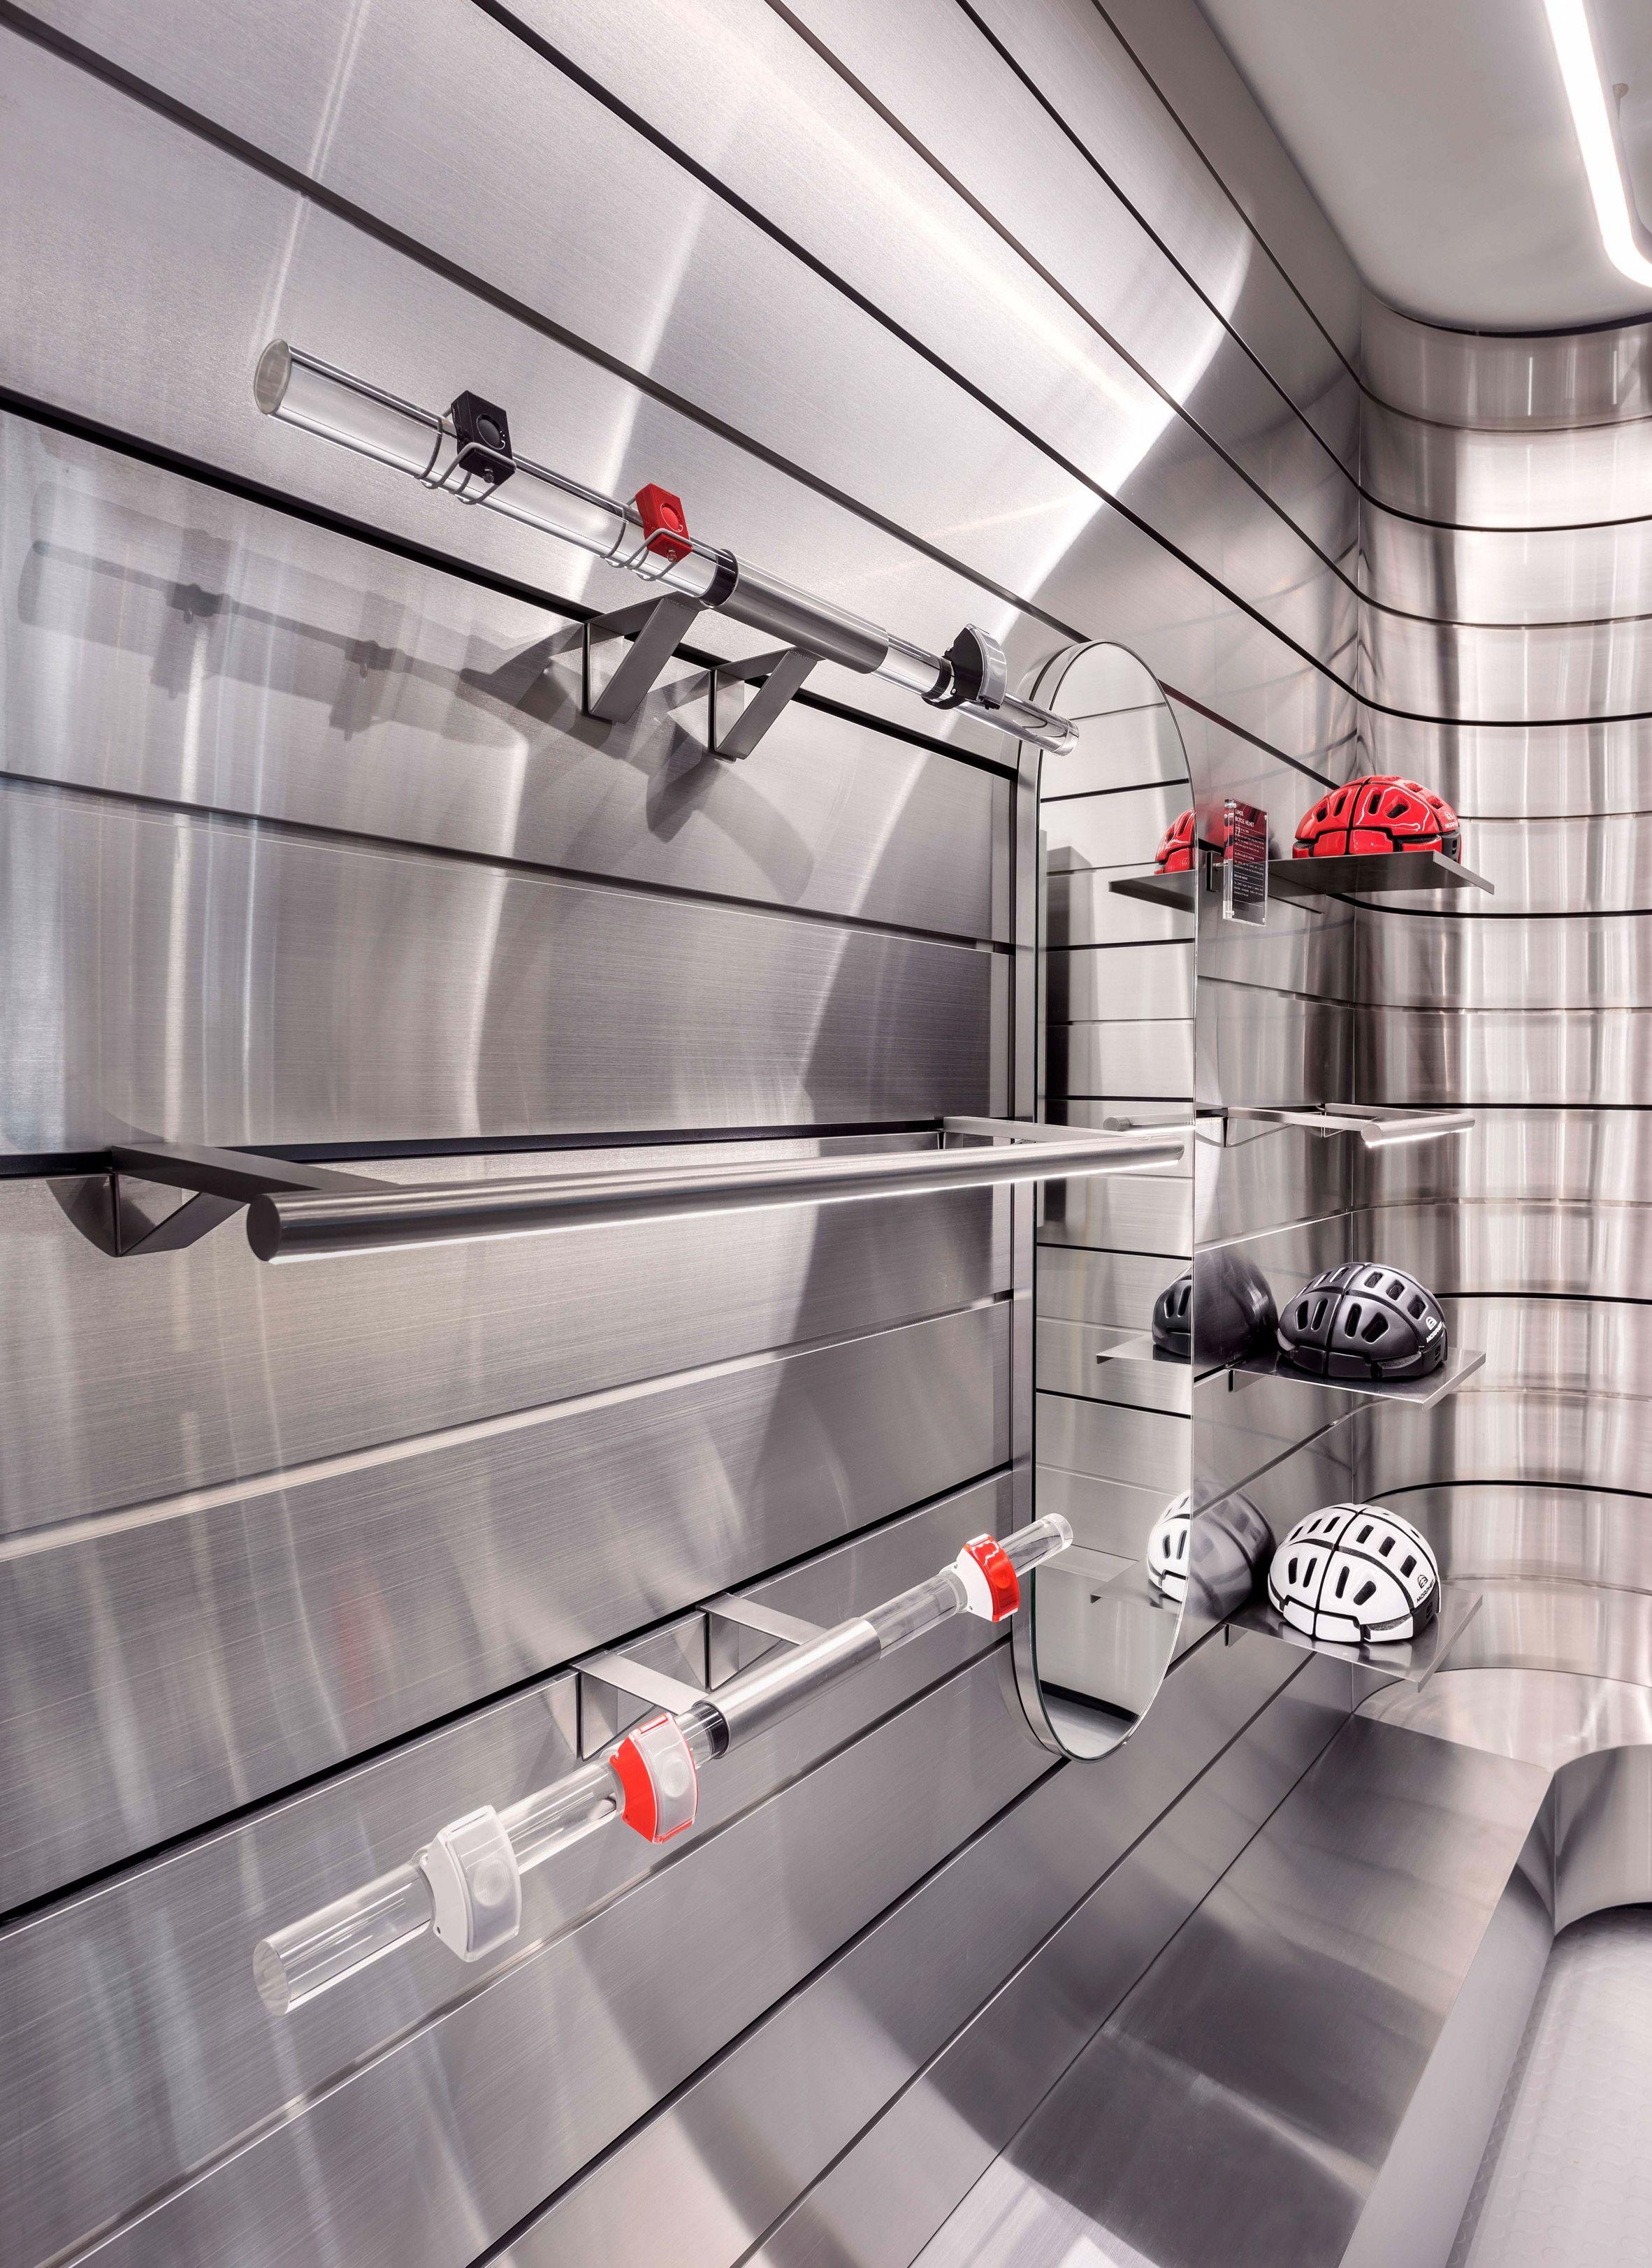 Ministry Of Design Completes Futuristic Durasport Store In